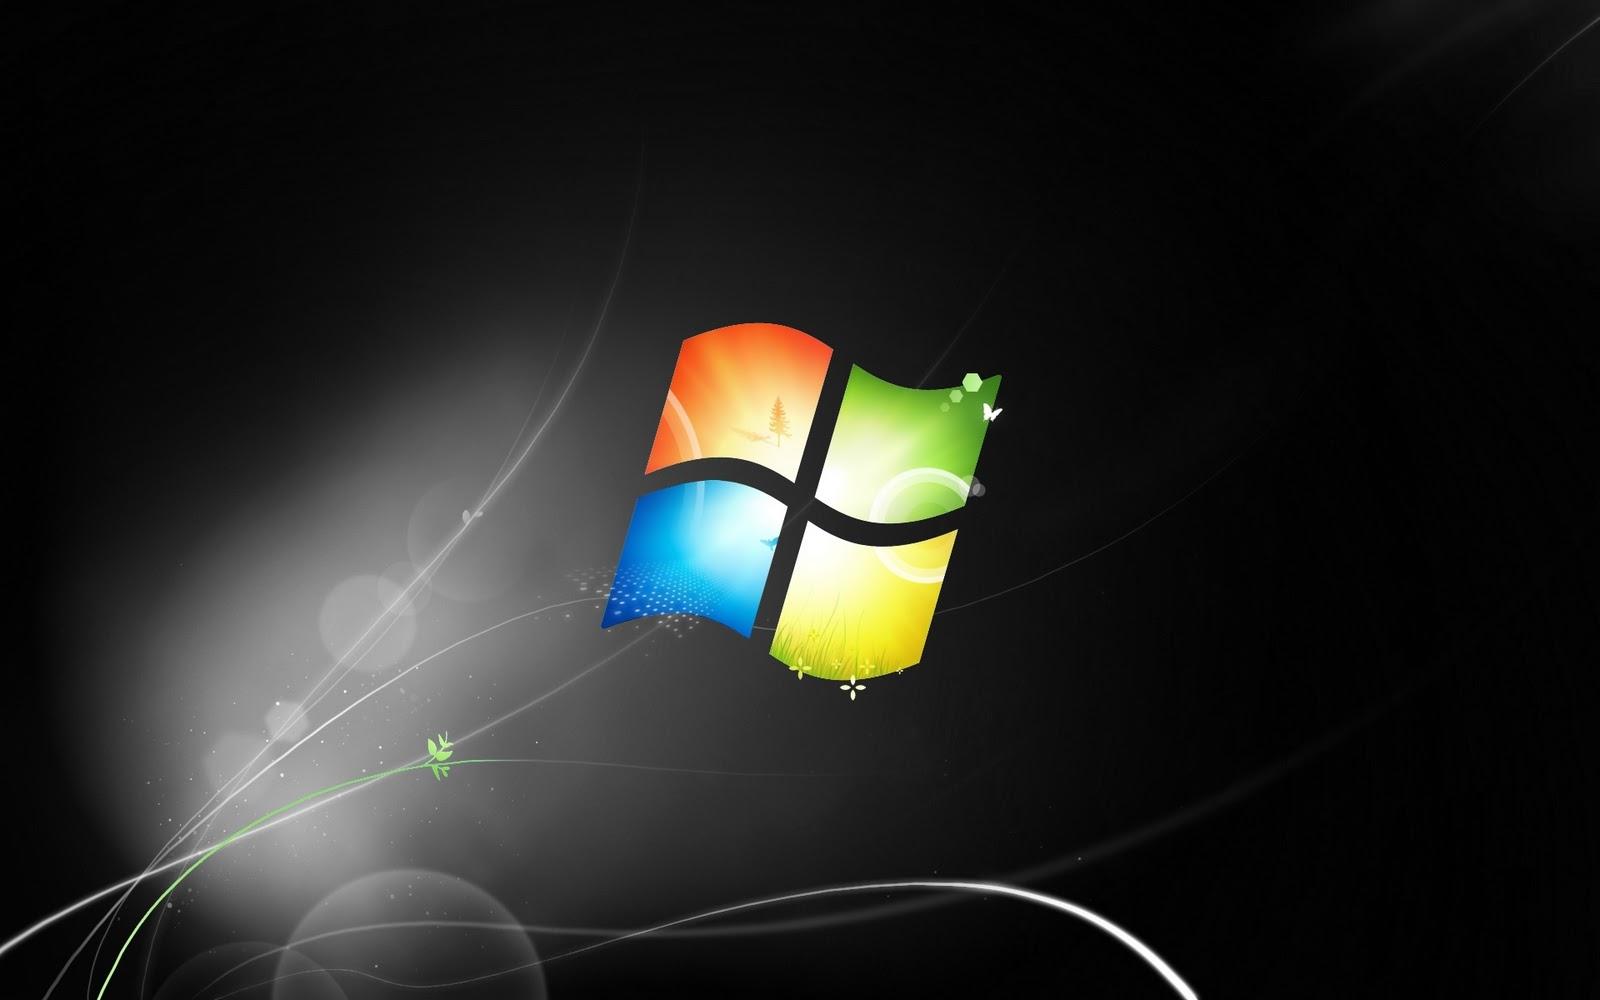 http://3.bp.blogspot.com/-jQTohCKMZMc/TdUVpTWe5dI/AAAAAAAAAlg/azUL4EDV6LY/s1600/Windows_7_Ultimate_Wallpaper_by_MOLIDANS.jpg